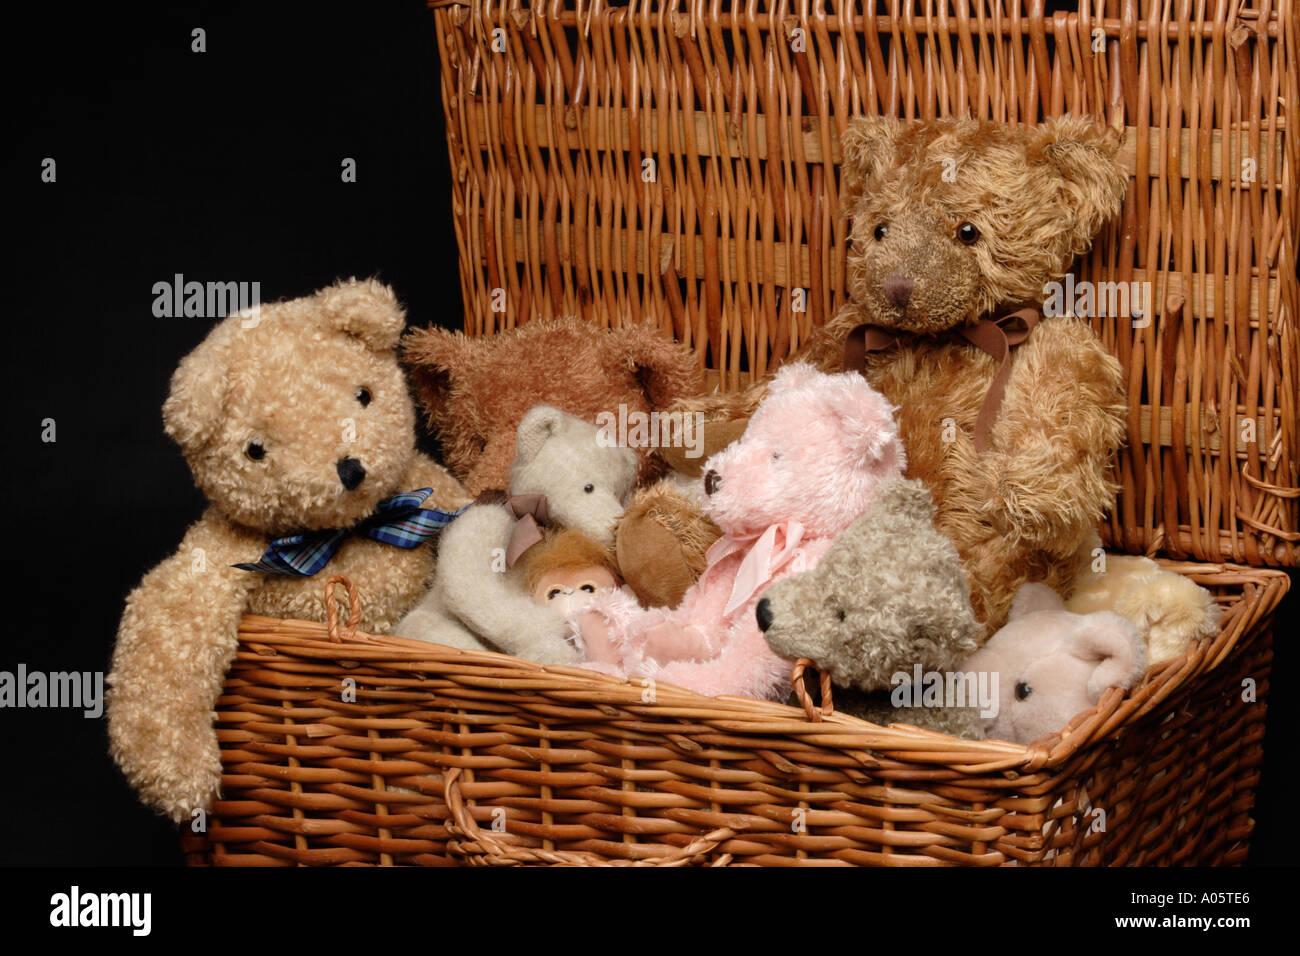 Childhood Toys Basket Full Of Teddy Bears Stockfoto